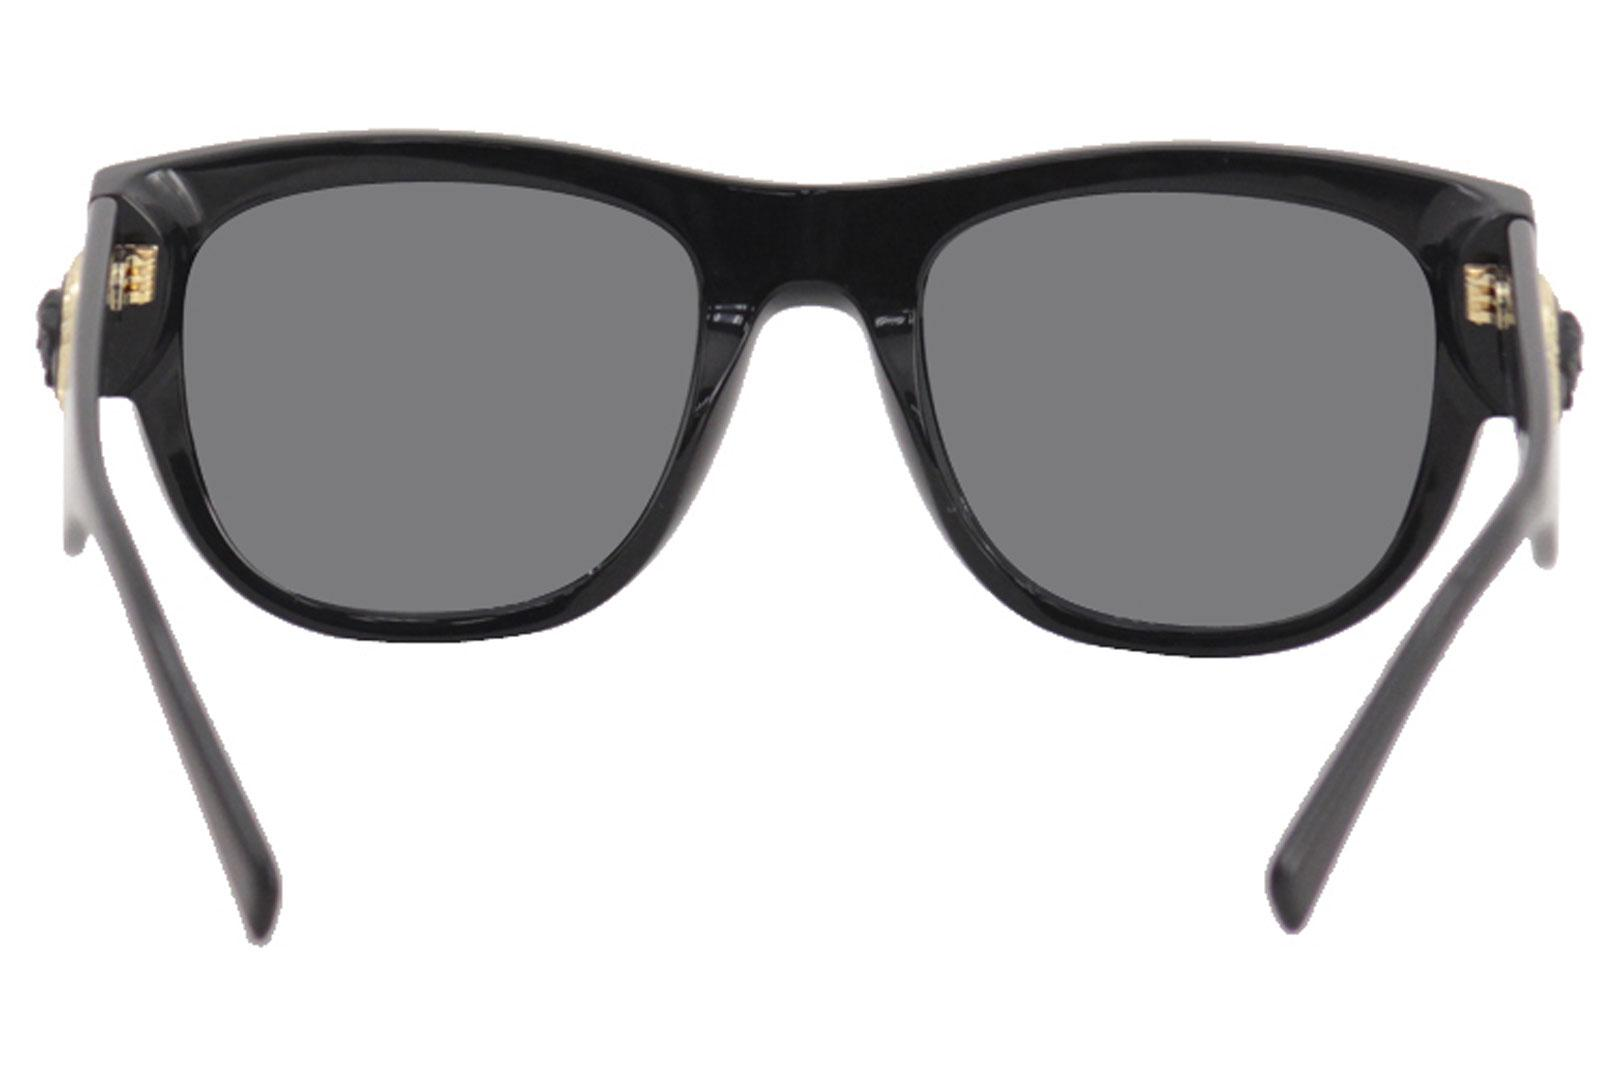 3c43982b14c8 Versace Men s VE4359 VE 4359 Fashion Square Sunglasses